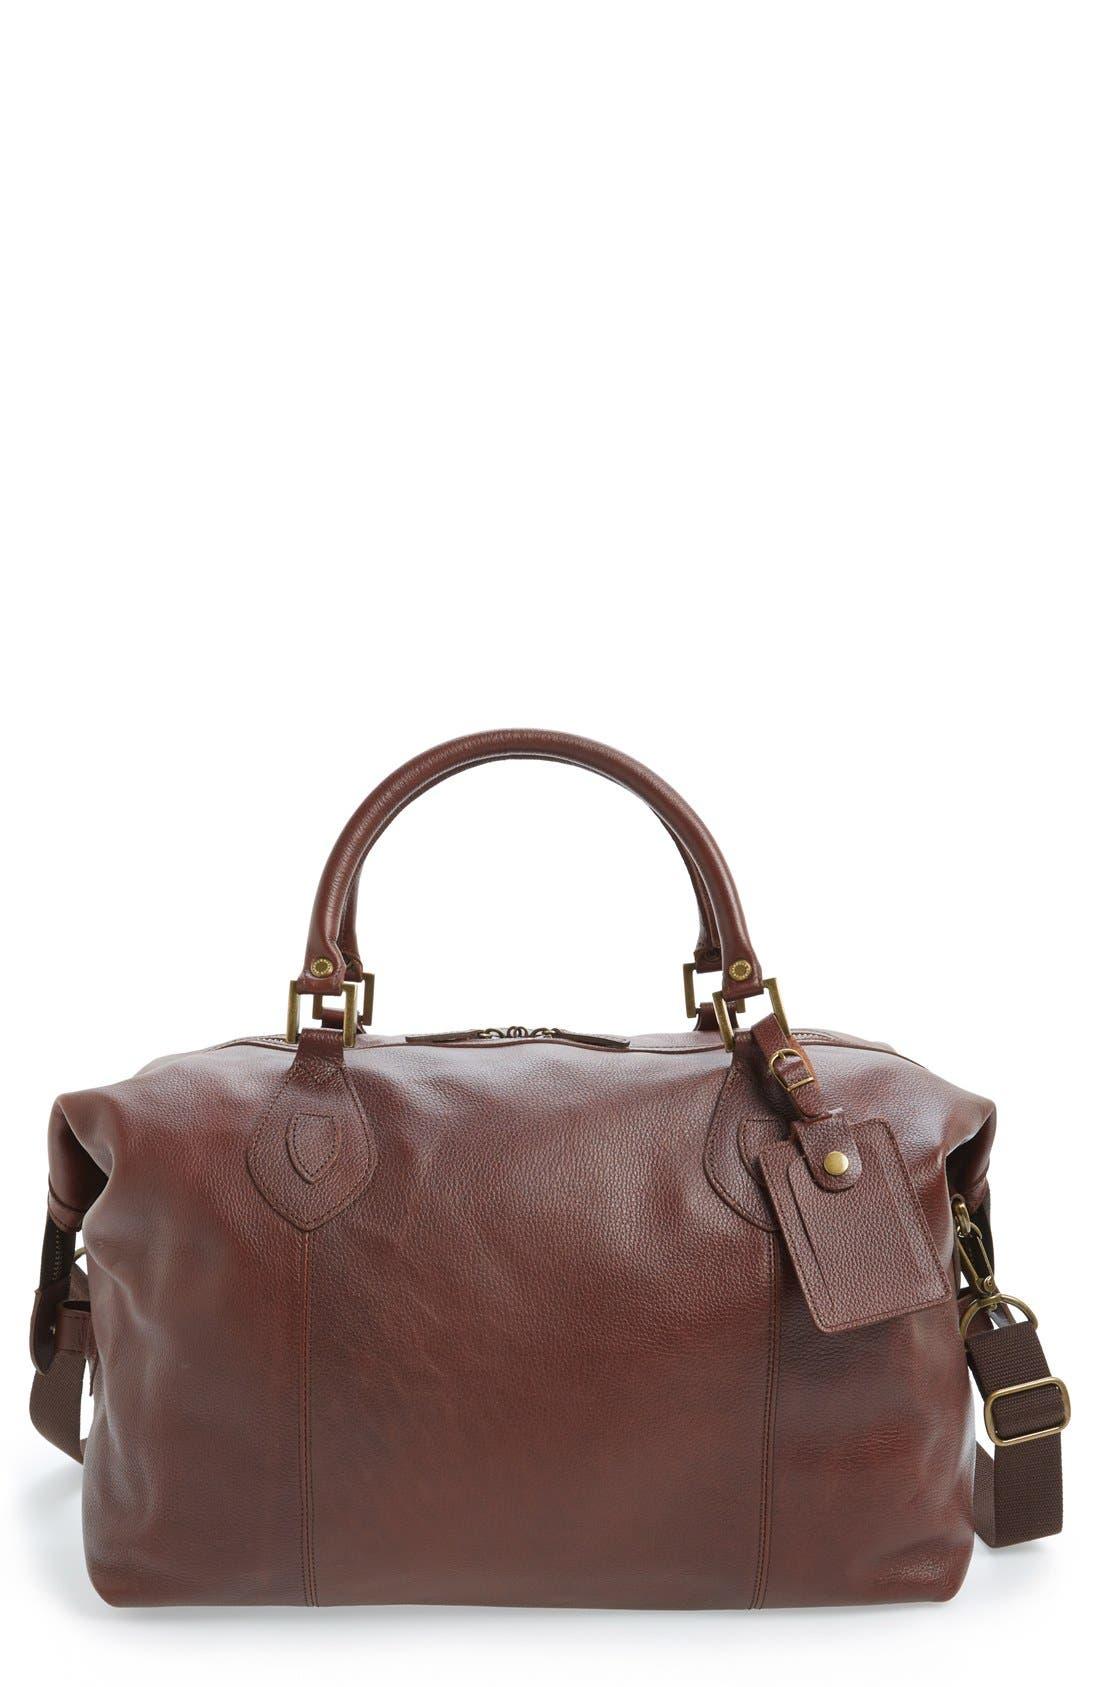 BARBOUR Leather Travel Bag, Main, color, DARK BROWN